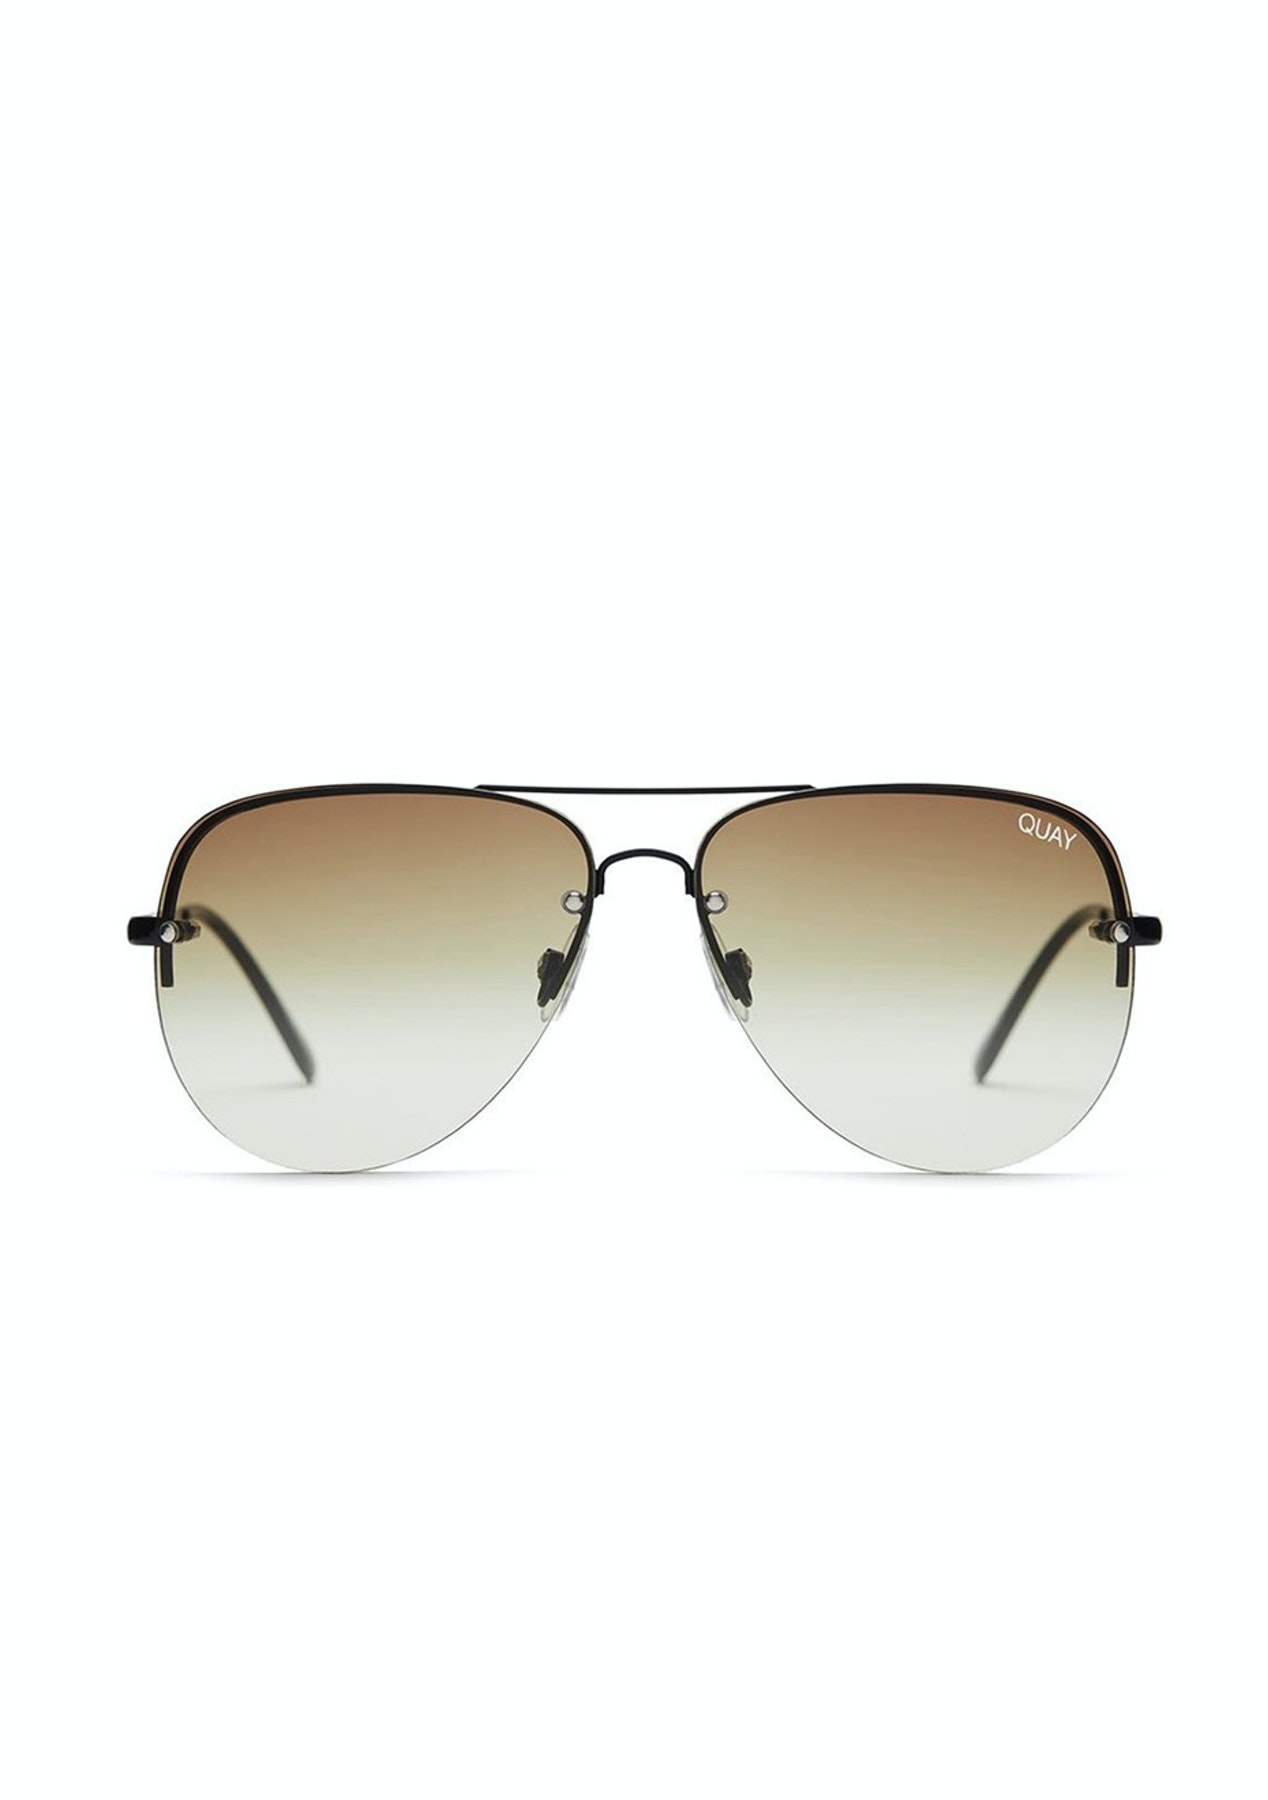 318b2cb4b9 Quay Australia - Muse Fade Black Brown Lens - Quay Australia - Onceit